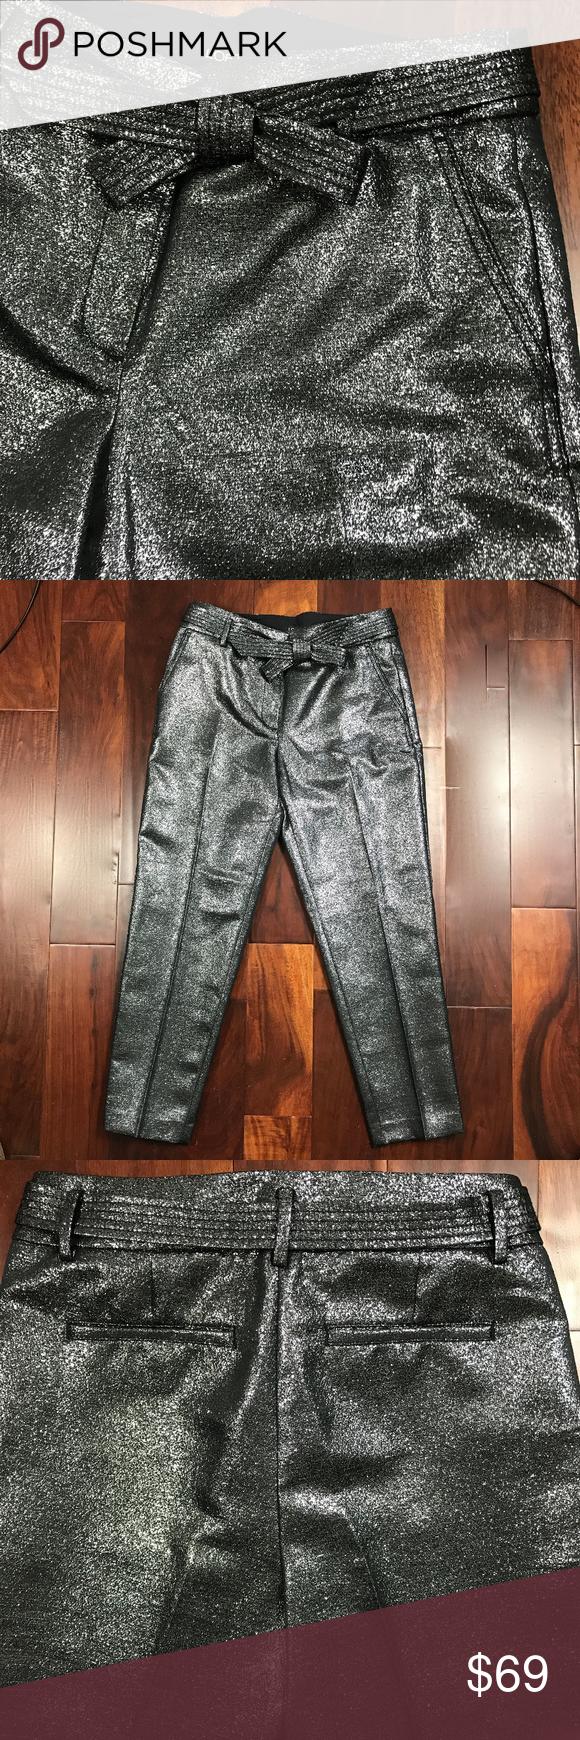 2a86efec0160 Loft Croped Metallic Textured Dressy Fancy Pants Just Beautiful Bow Belt  detail Loft Cropped Dressy Pants | Loft Metallic Textured Pants | Color: ...